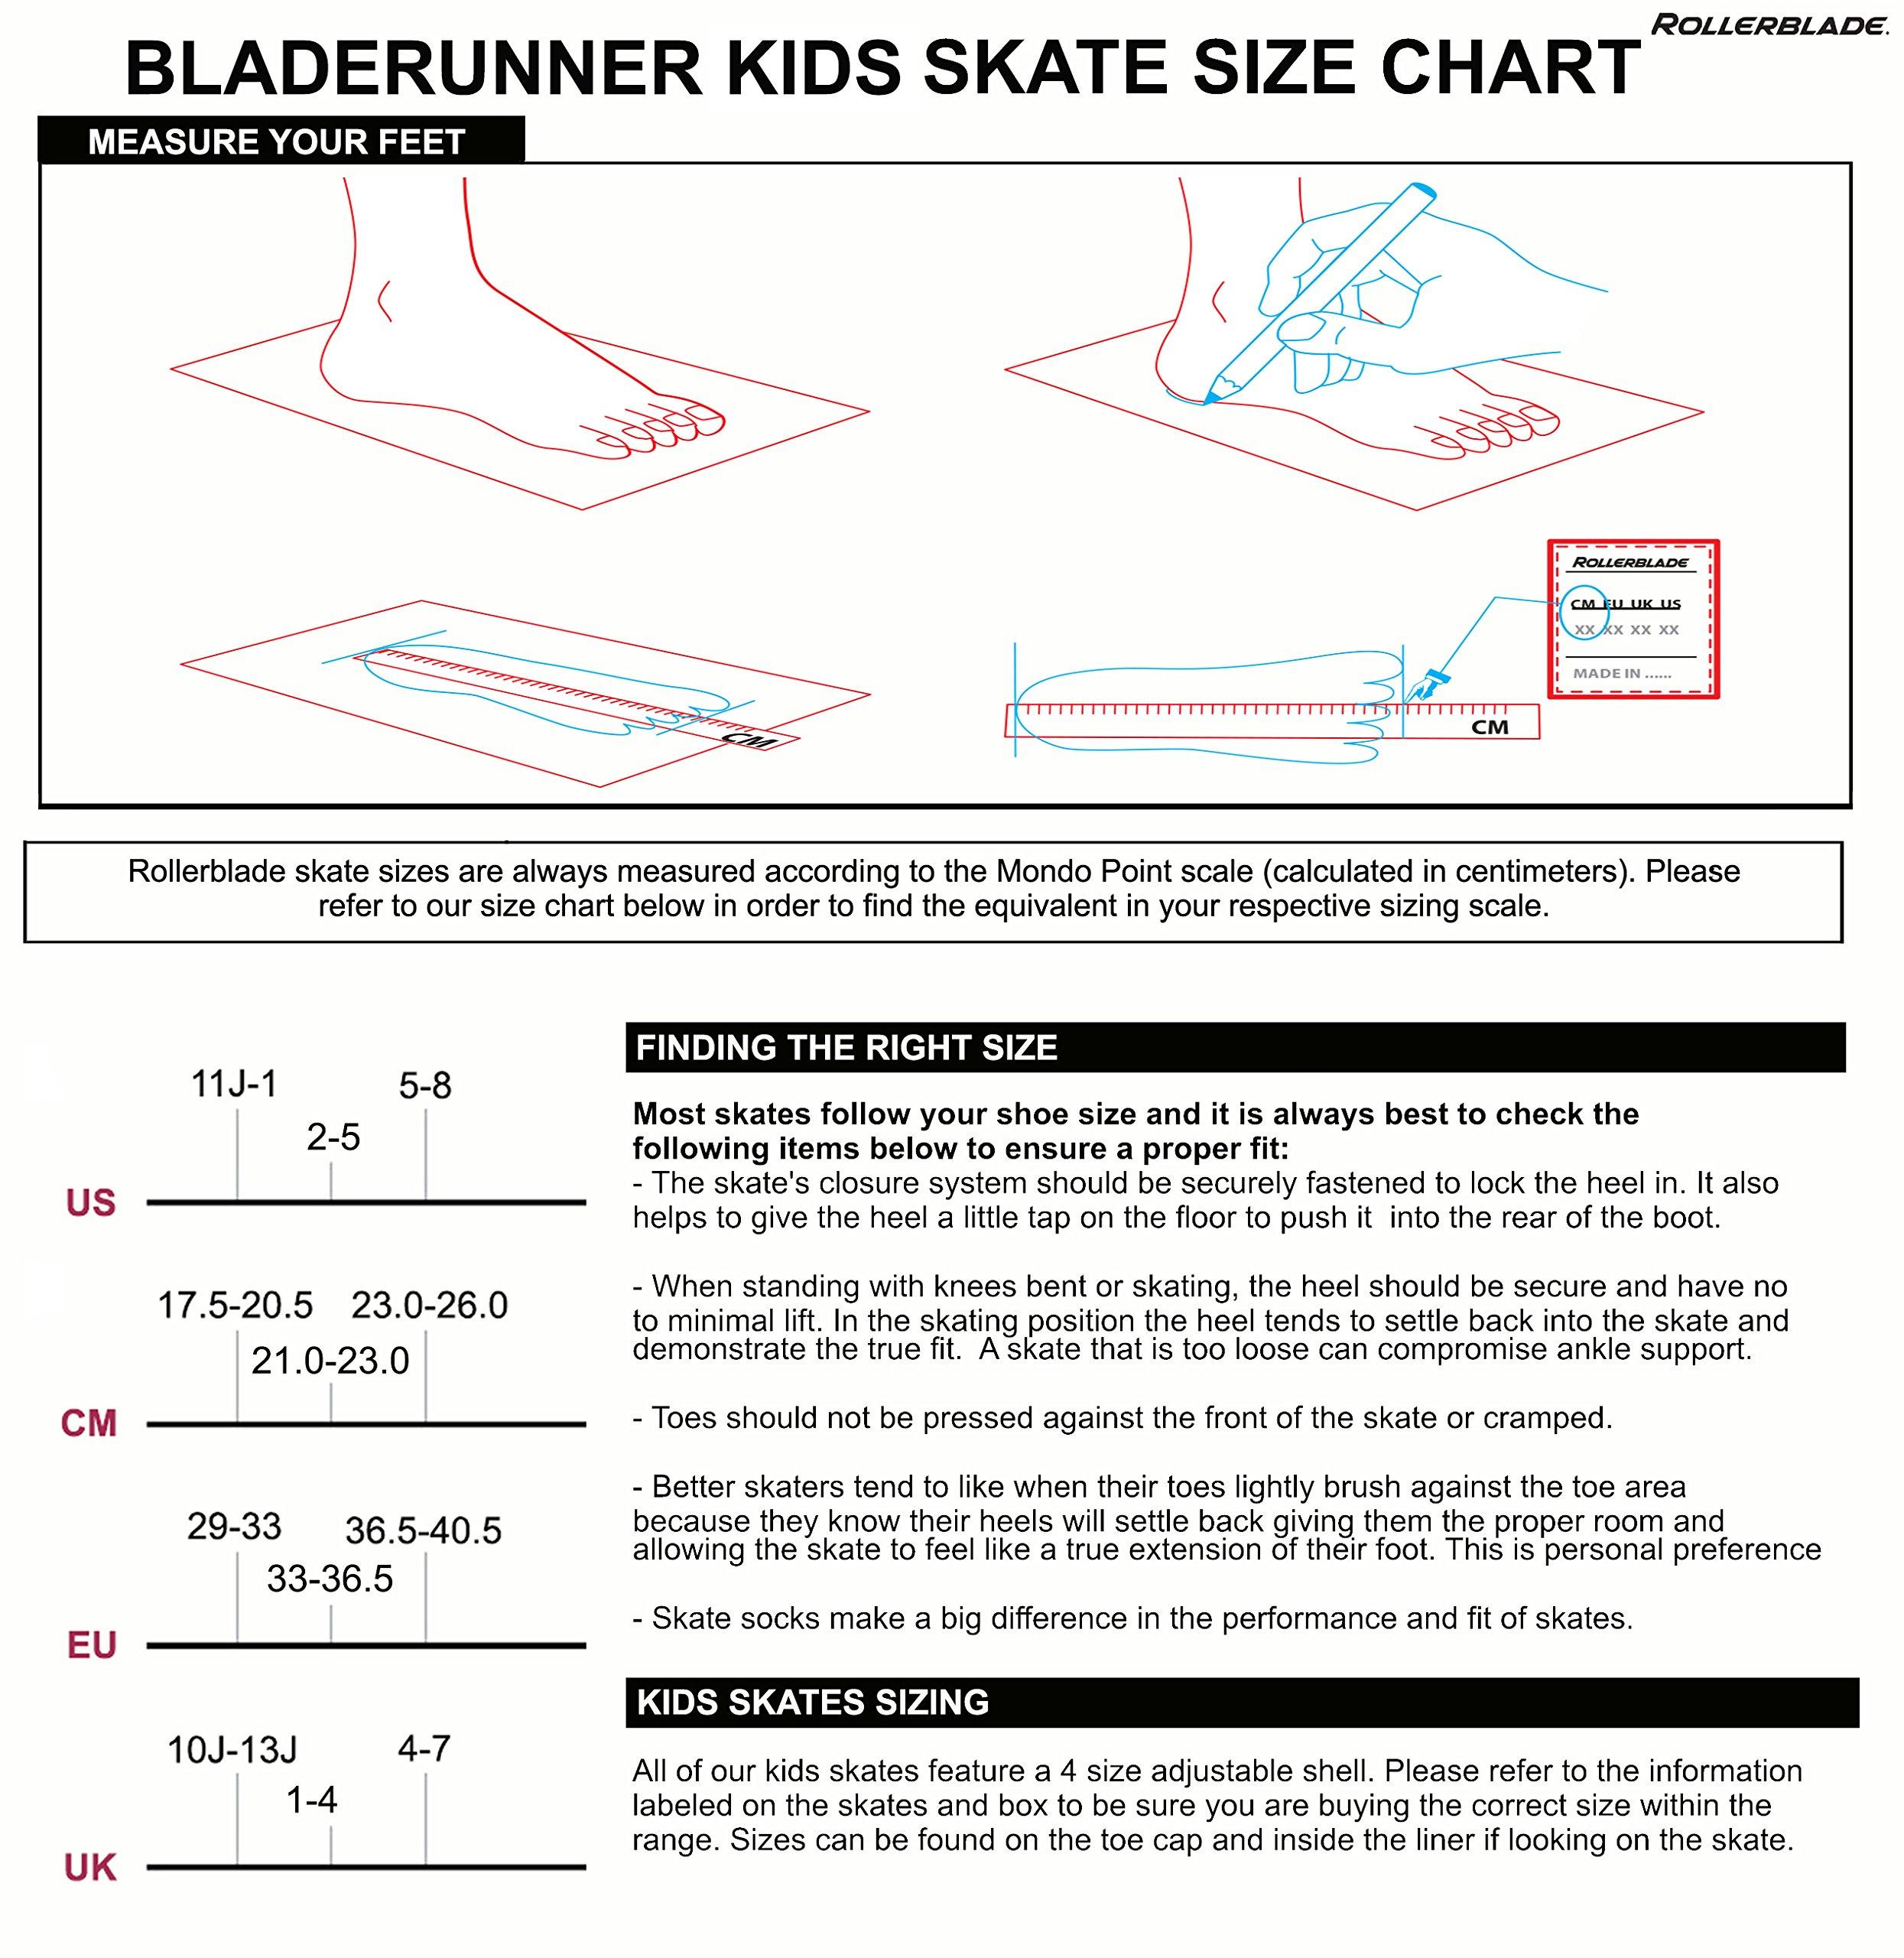 Rollerblade Bladerunner Phoenix Girls Adjustable Fitness Inline Skate, White and Pink, Junior, Value Performance Inline Skates, Youth Junior 1 to 4 by Rollerblade (Image #4)